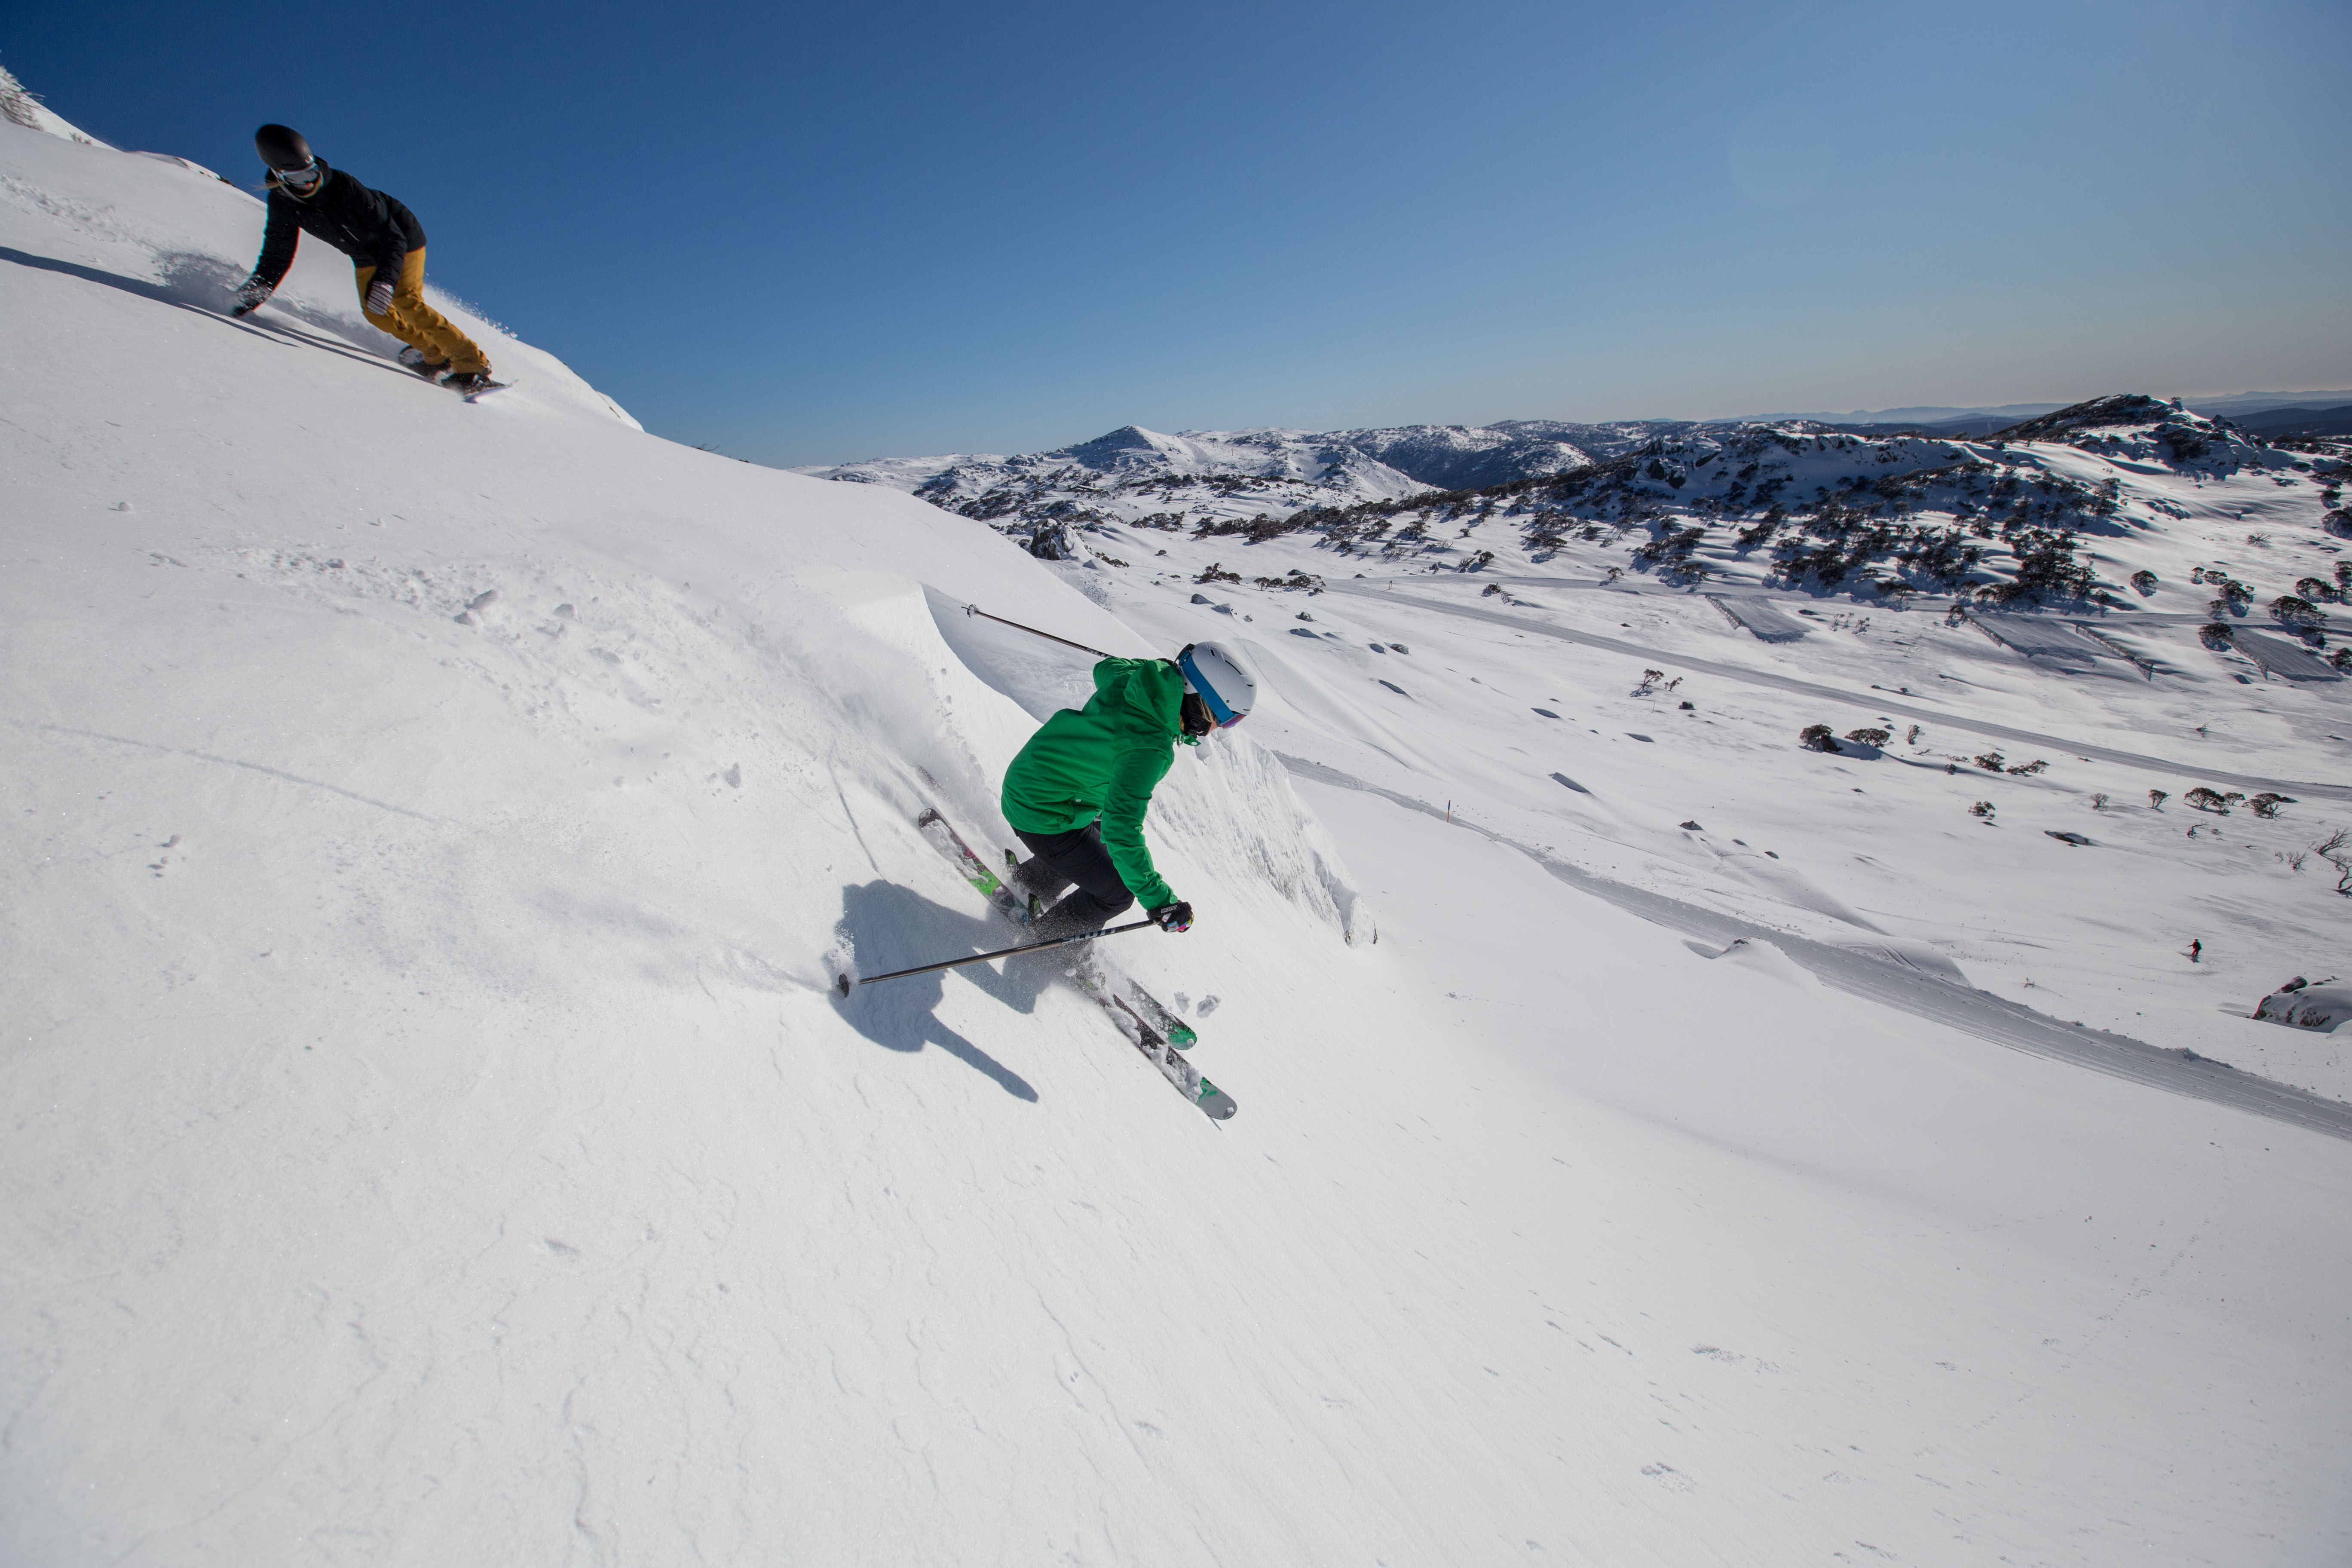 Friends-Skiing-Snowboarding-Perisher